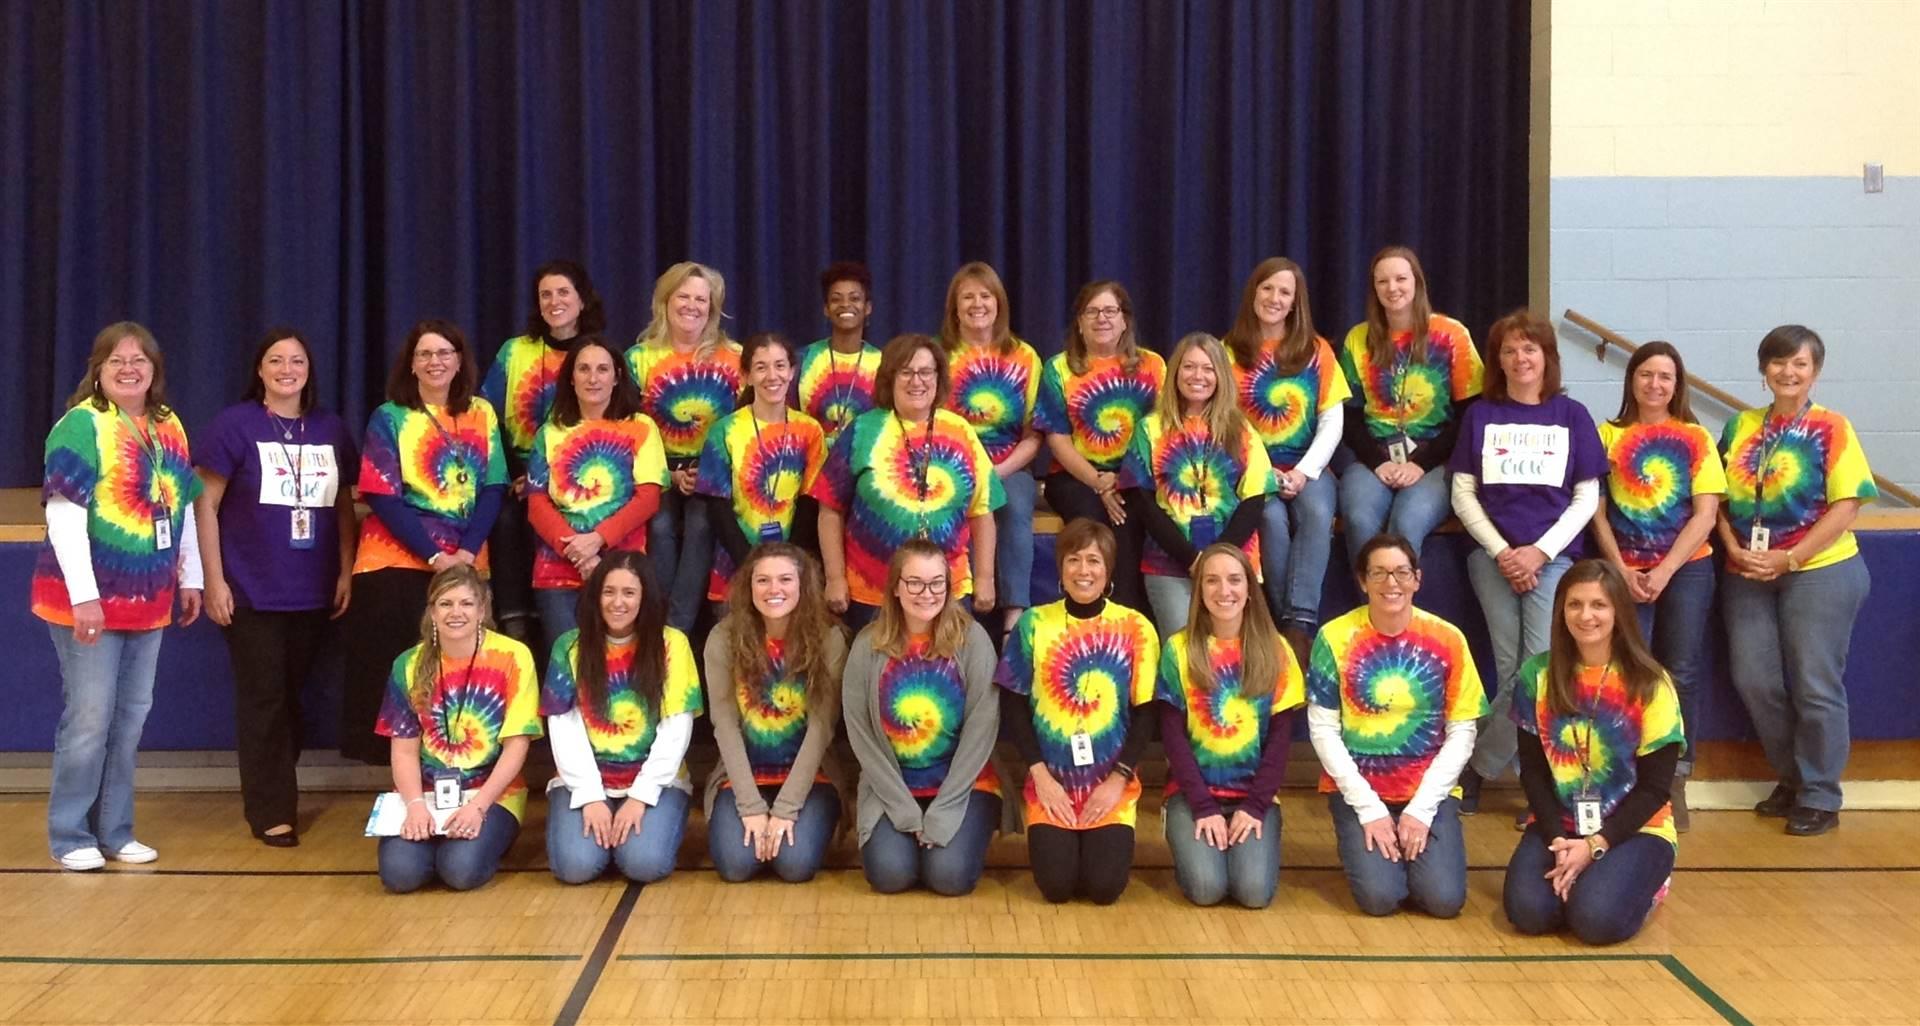 GP Staff Wearing Tie-Dyed T-Shirts